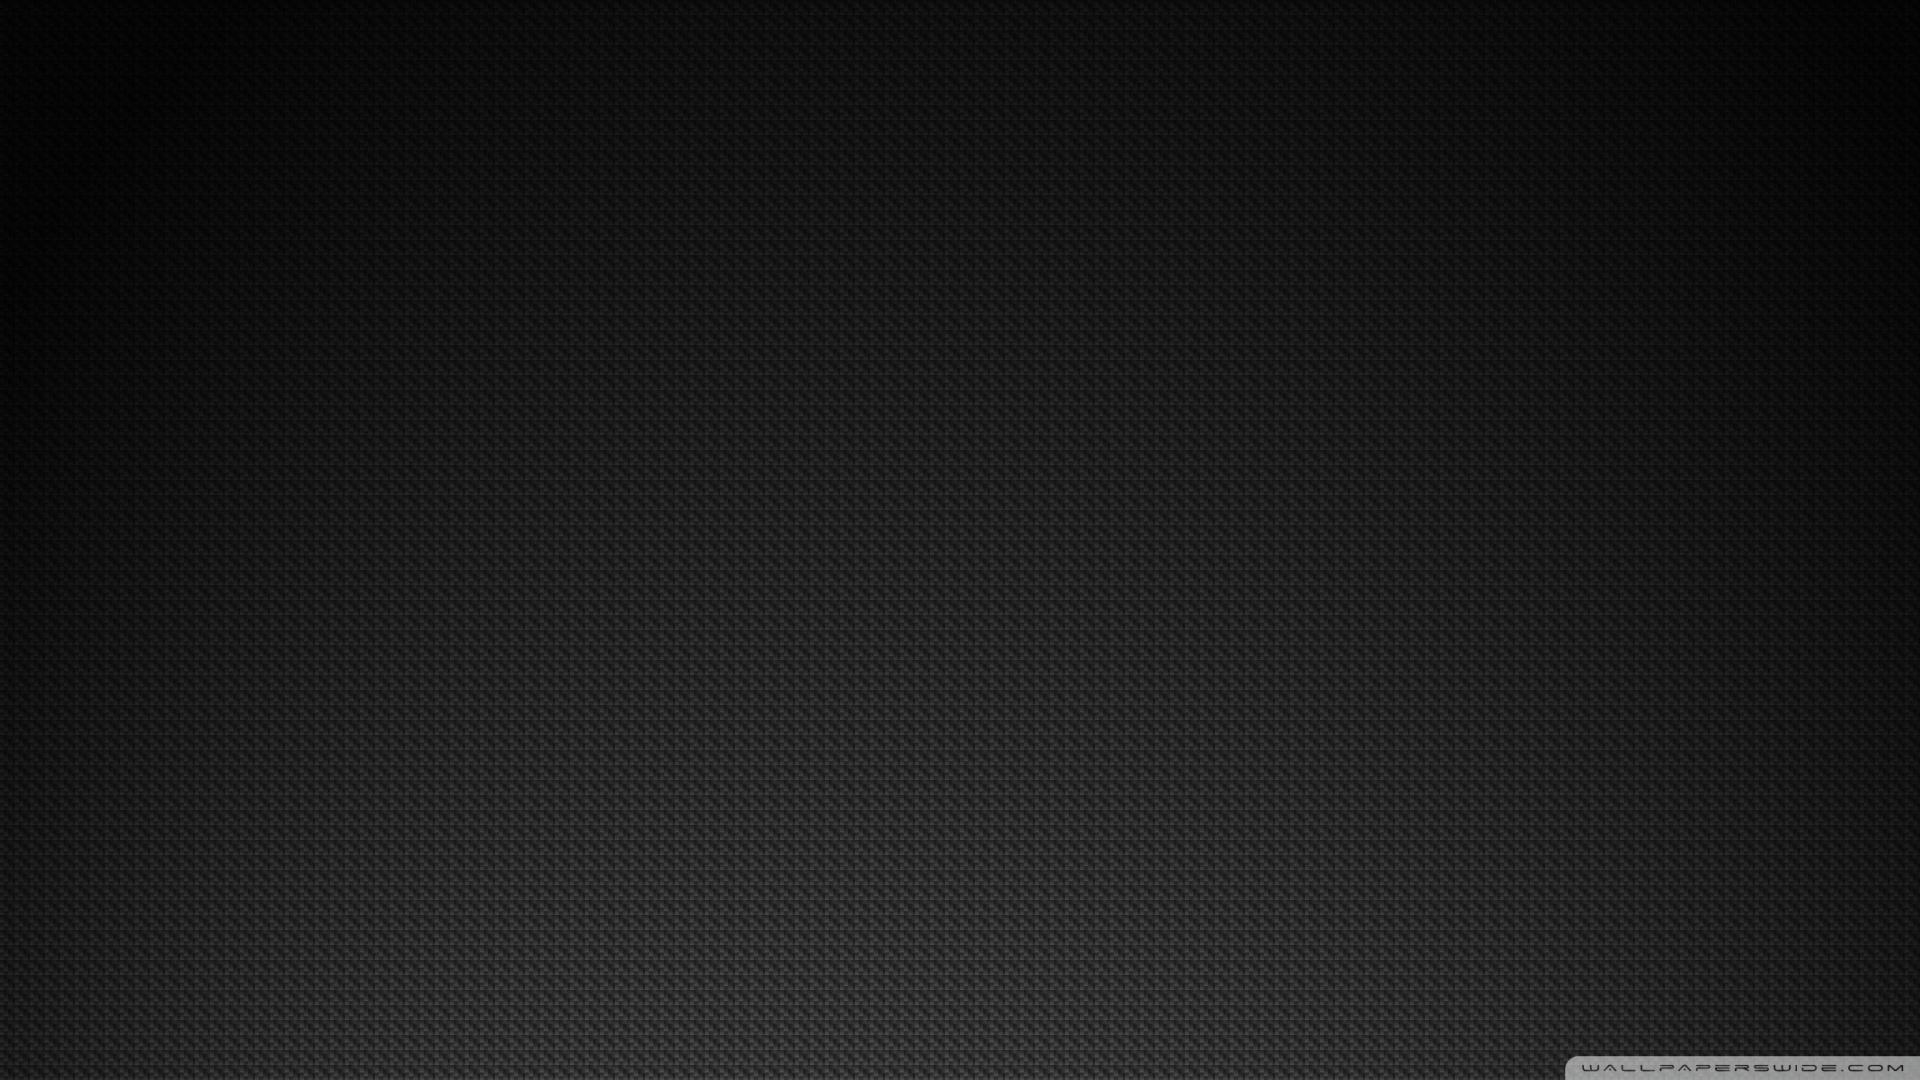 Carbon Fiber Background Wallpaper 1920x1080 Carbon Fiber Background 1920x1080